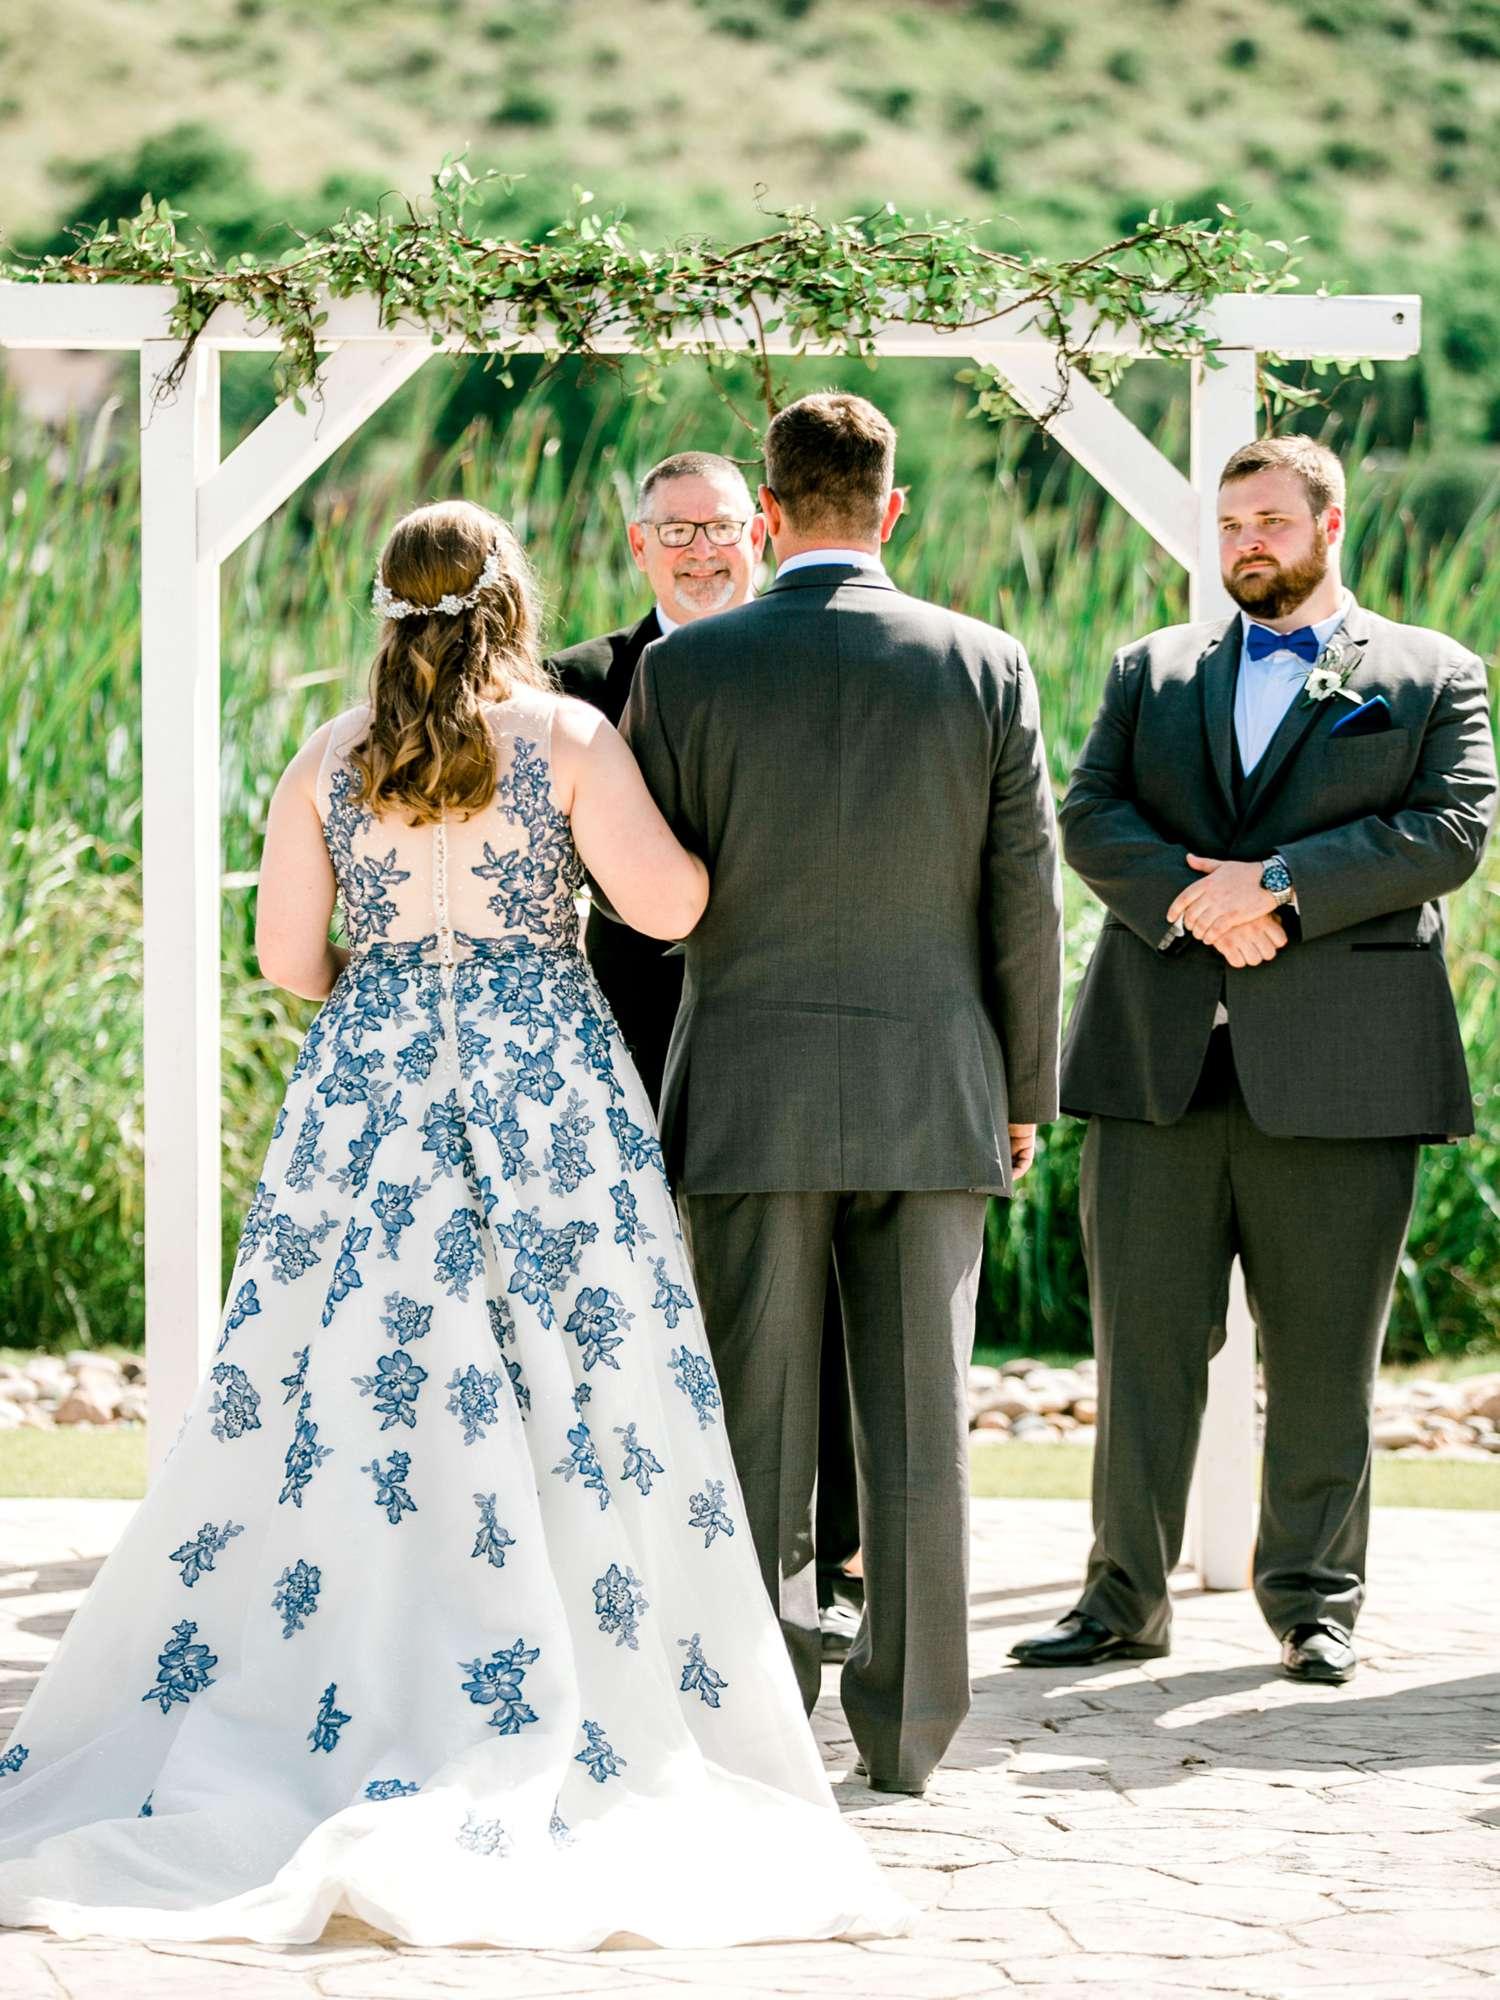 TY+NATHAN+HALLIER+ALLEEJ+WEDDING+PHOTOGRAPHER+RANSOM+CANYON_0072.jpg